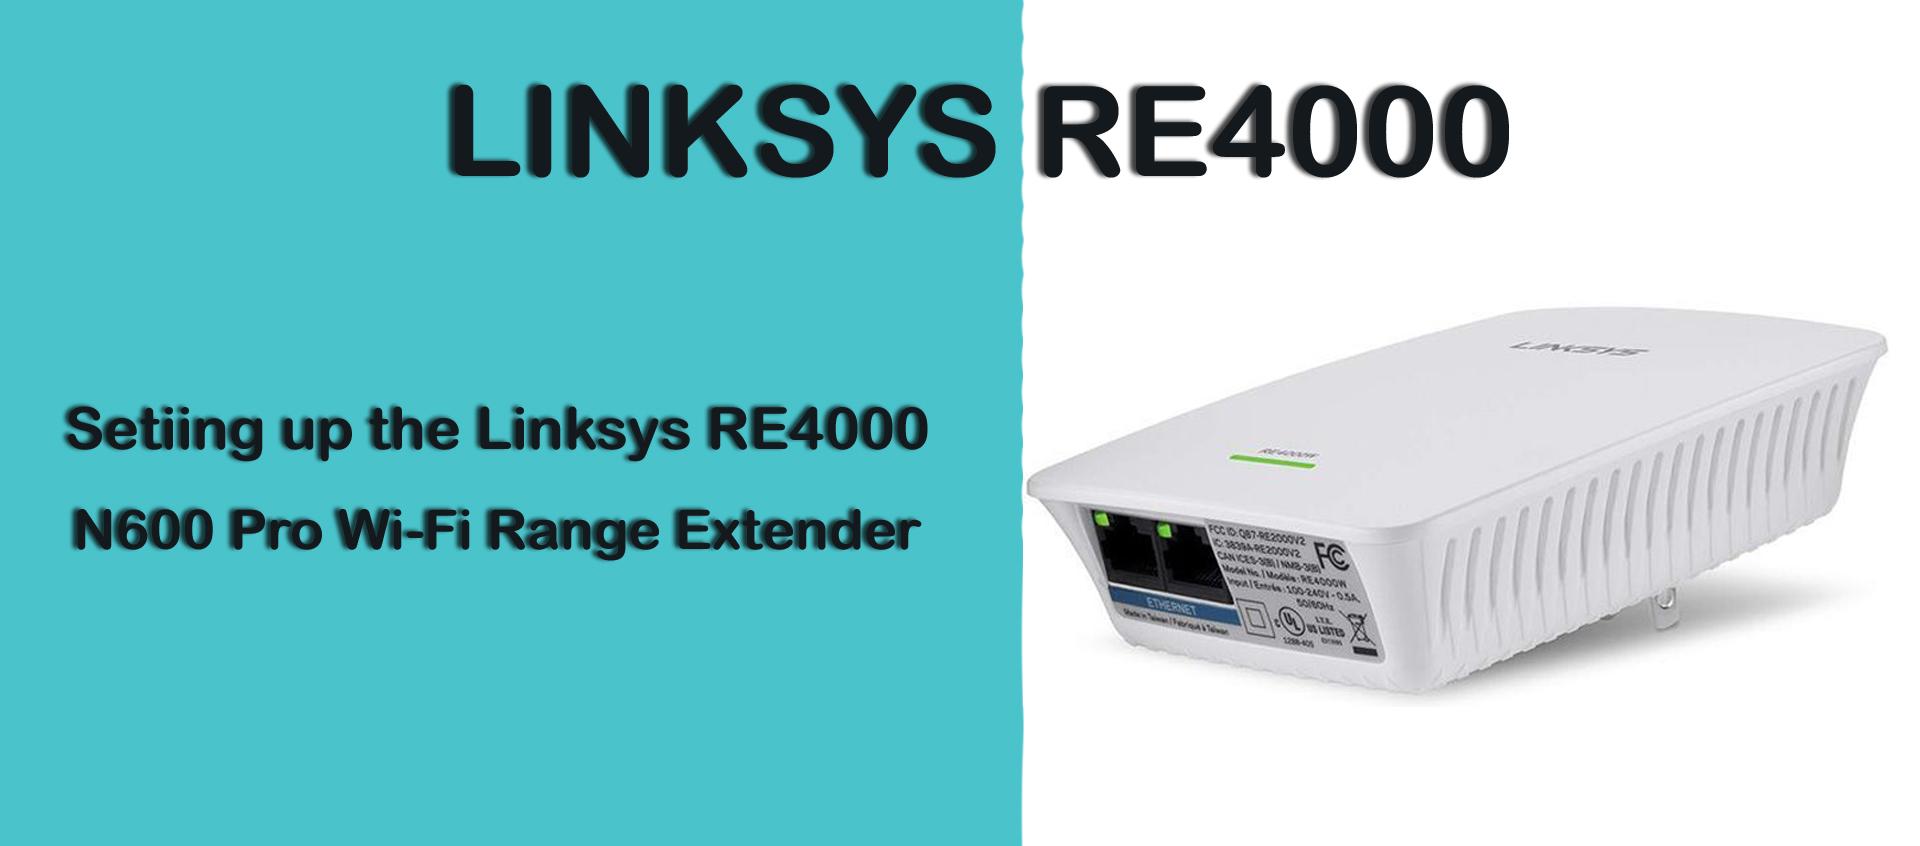 linksys re4000w dual-band extender setup